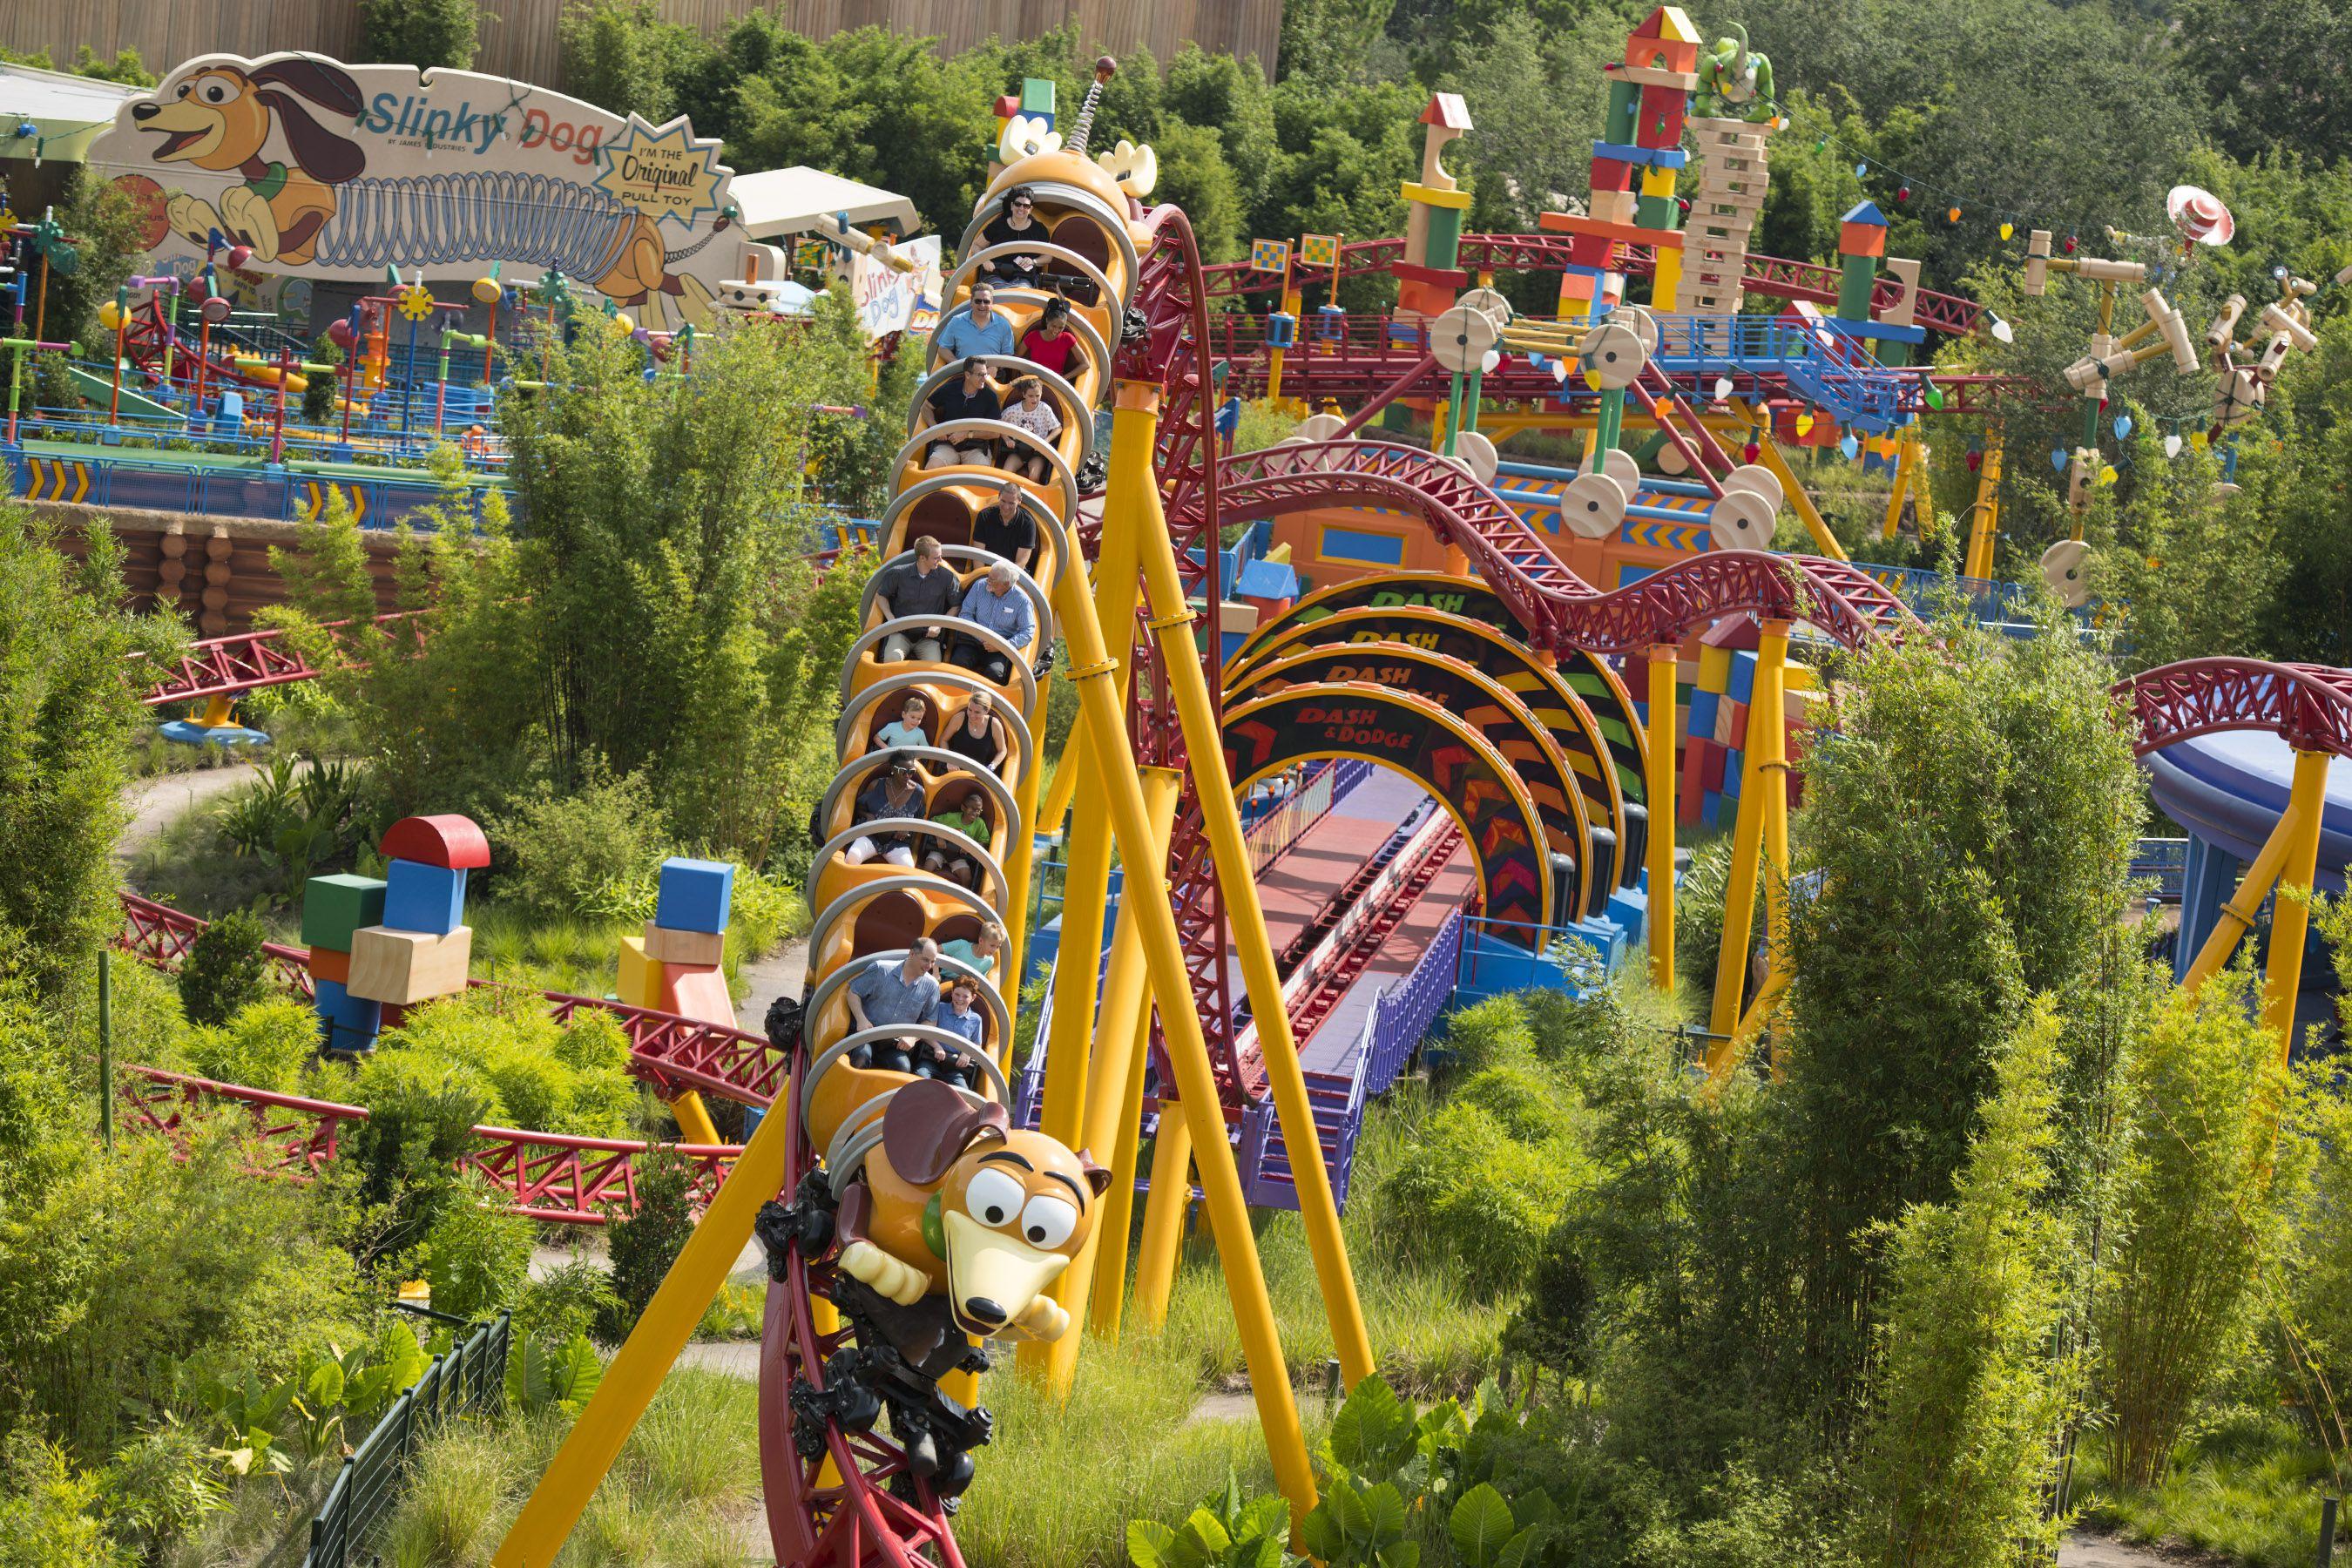 Montaña rusa Slinky Dog Dash en Disney World Toy Story Land